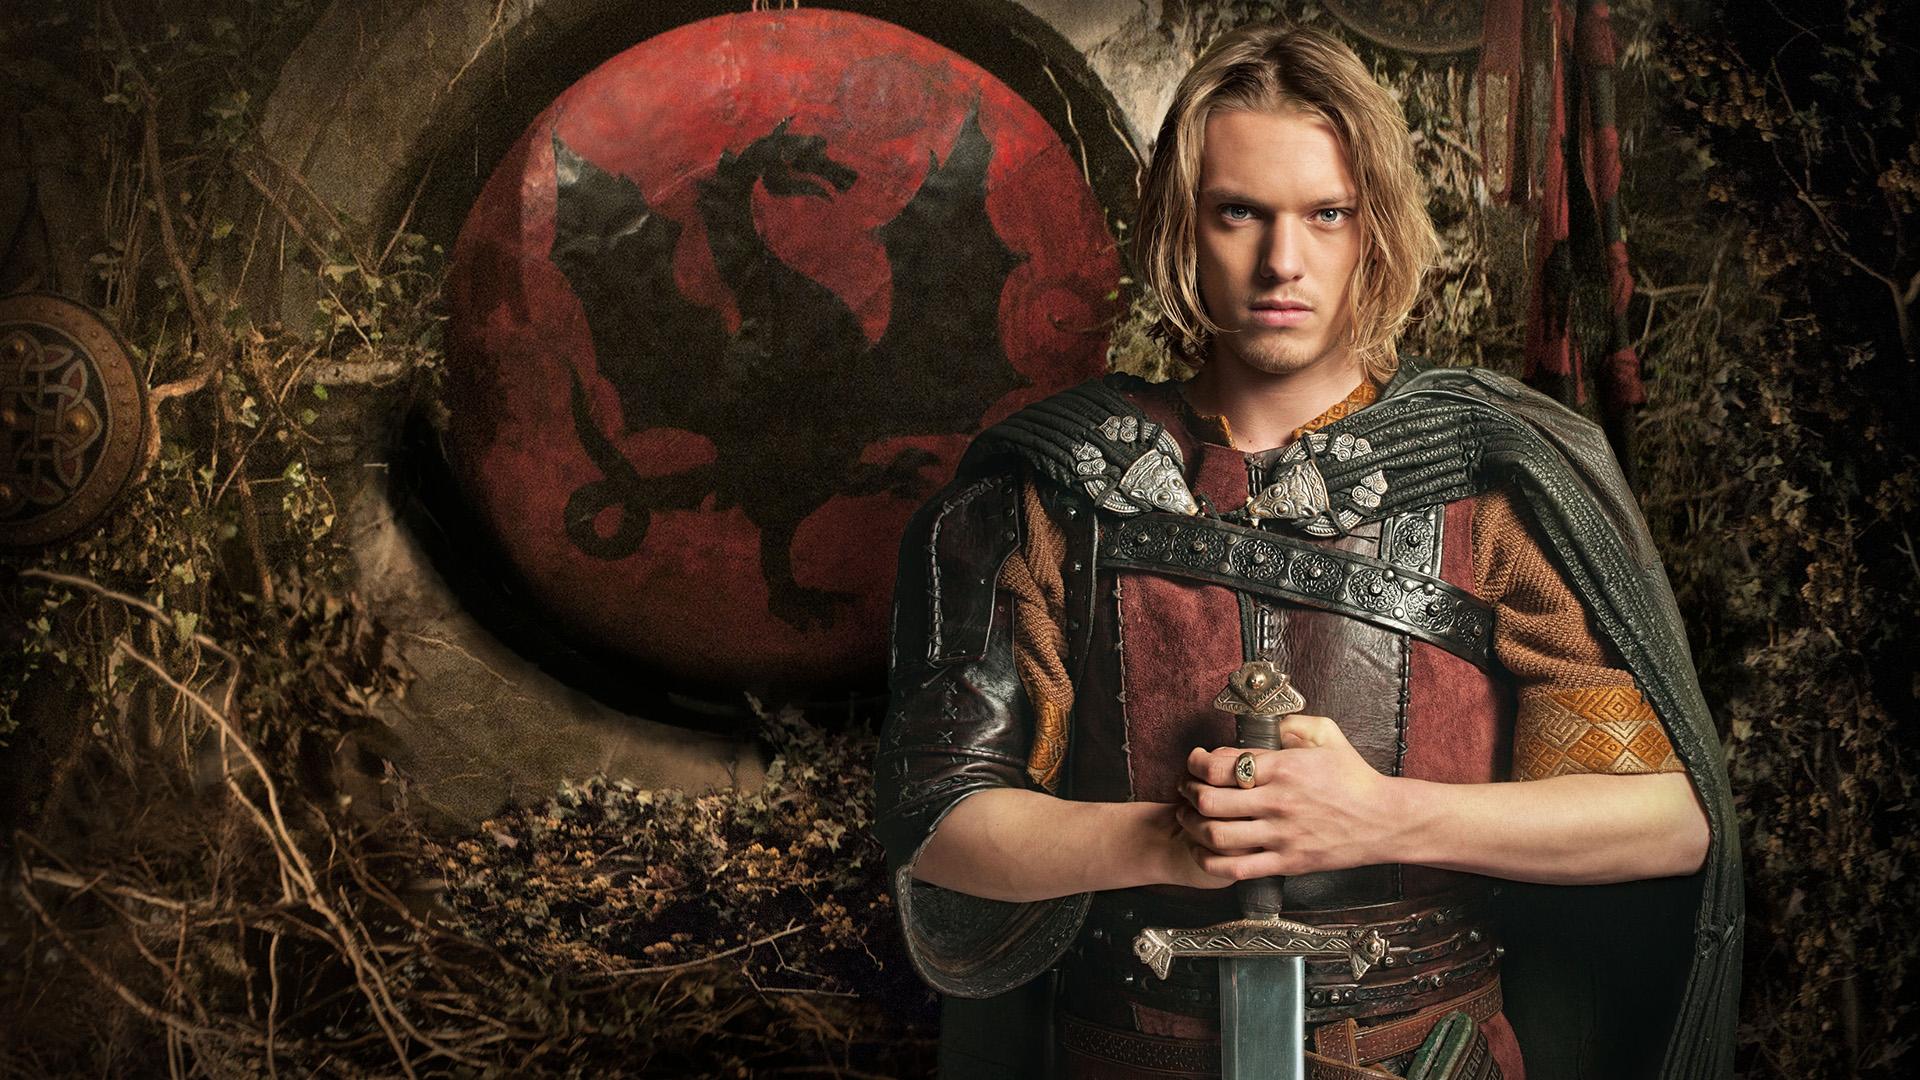 King Arthur Once Upon A Time